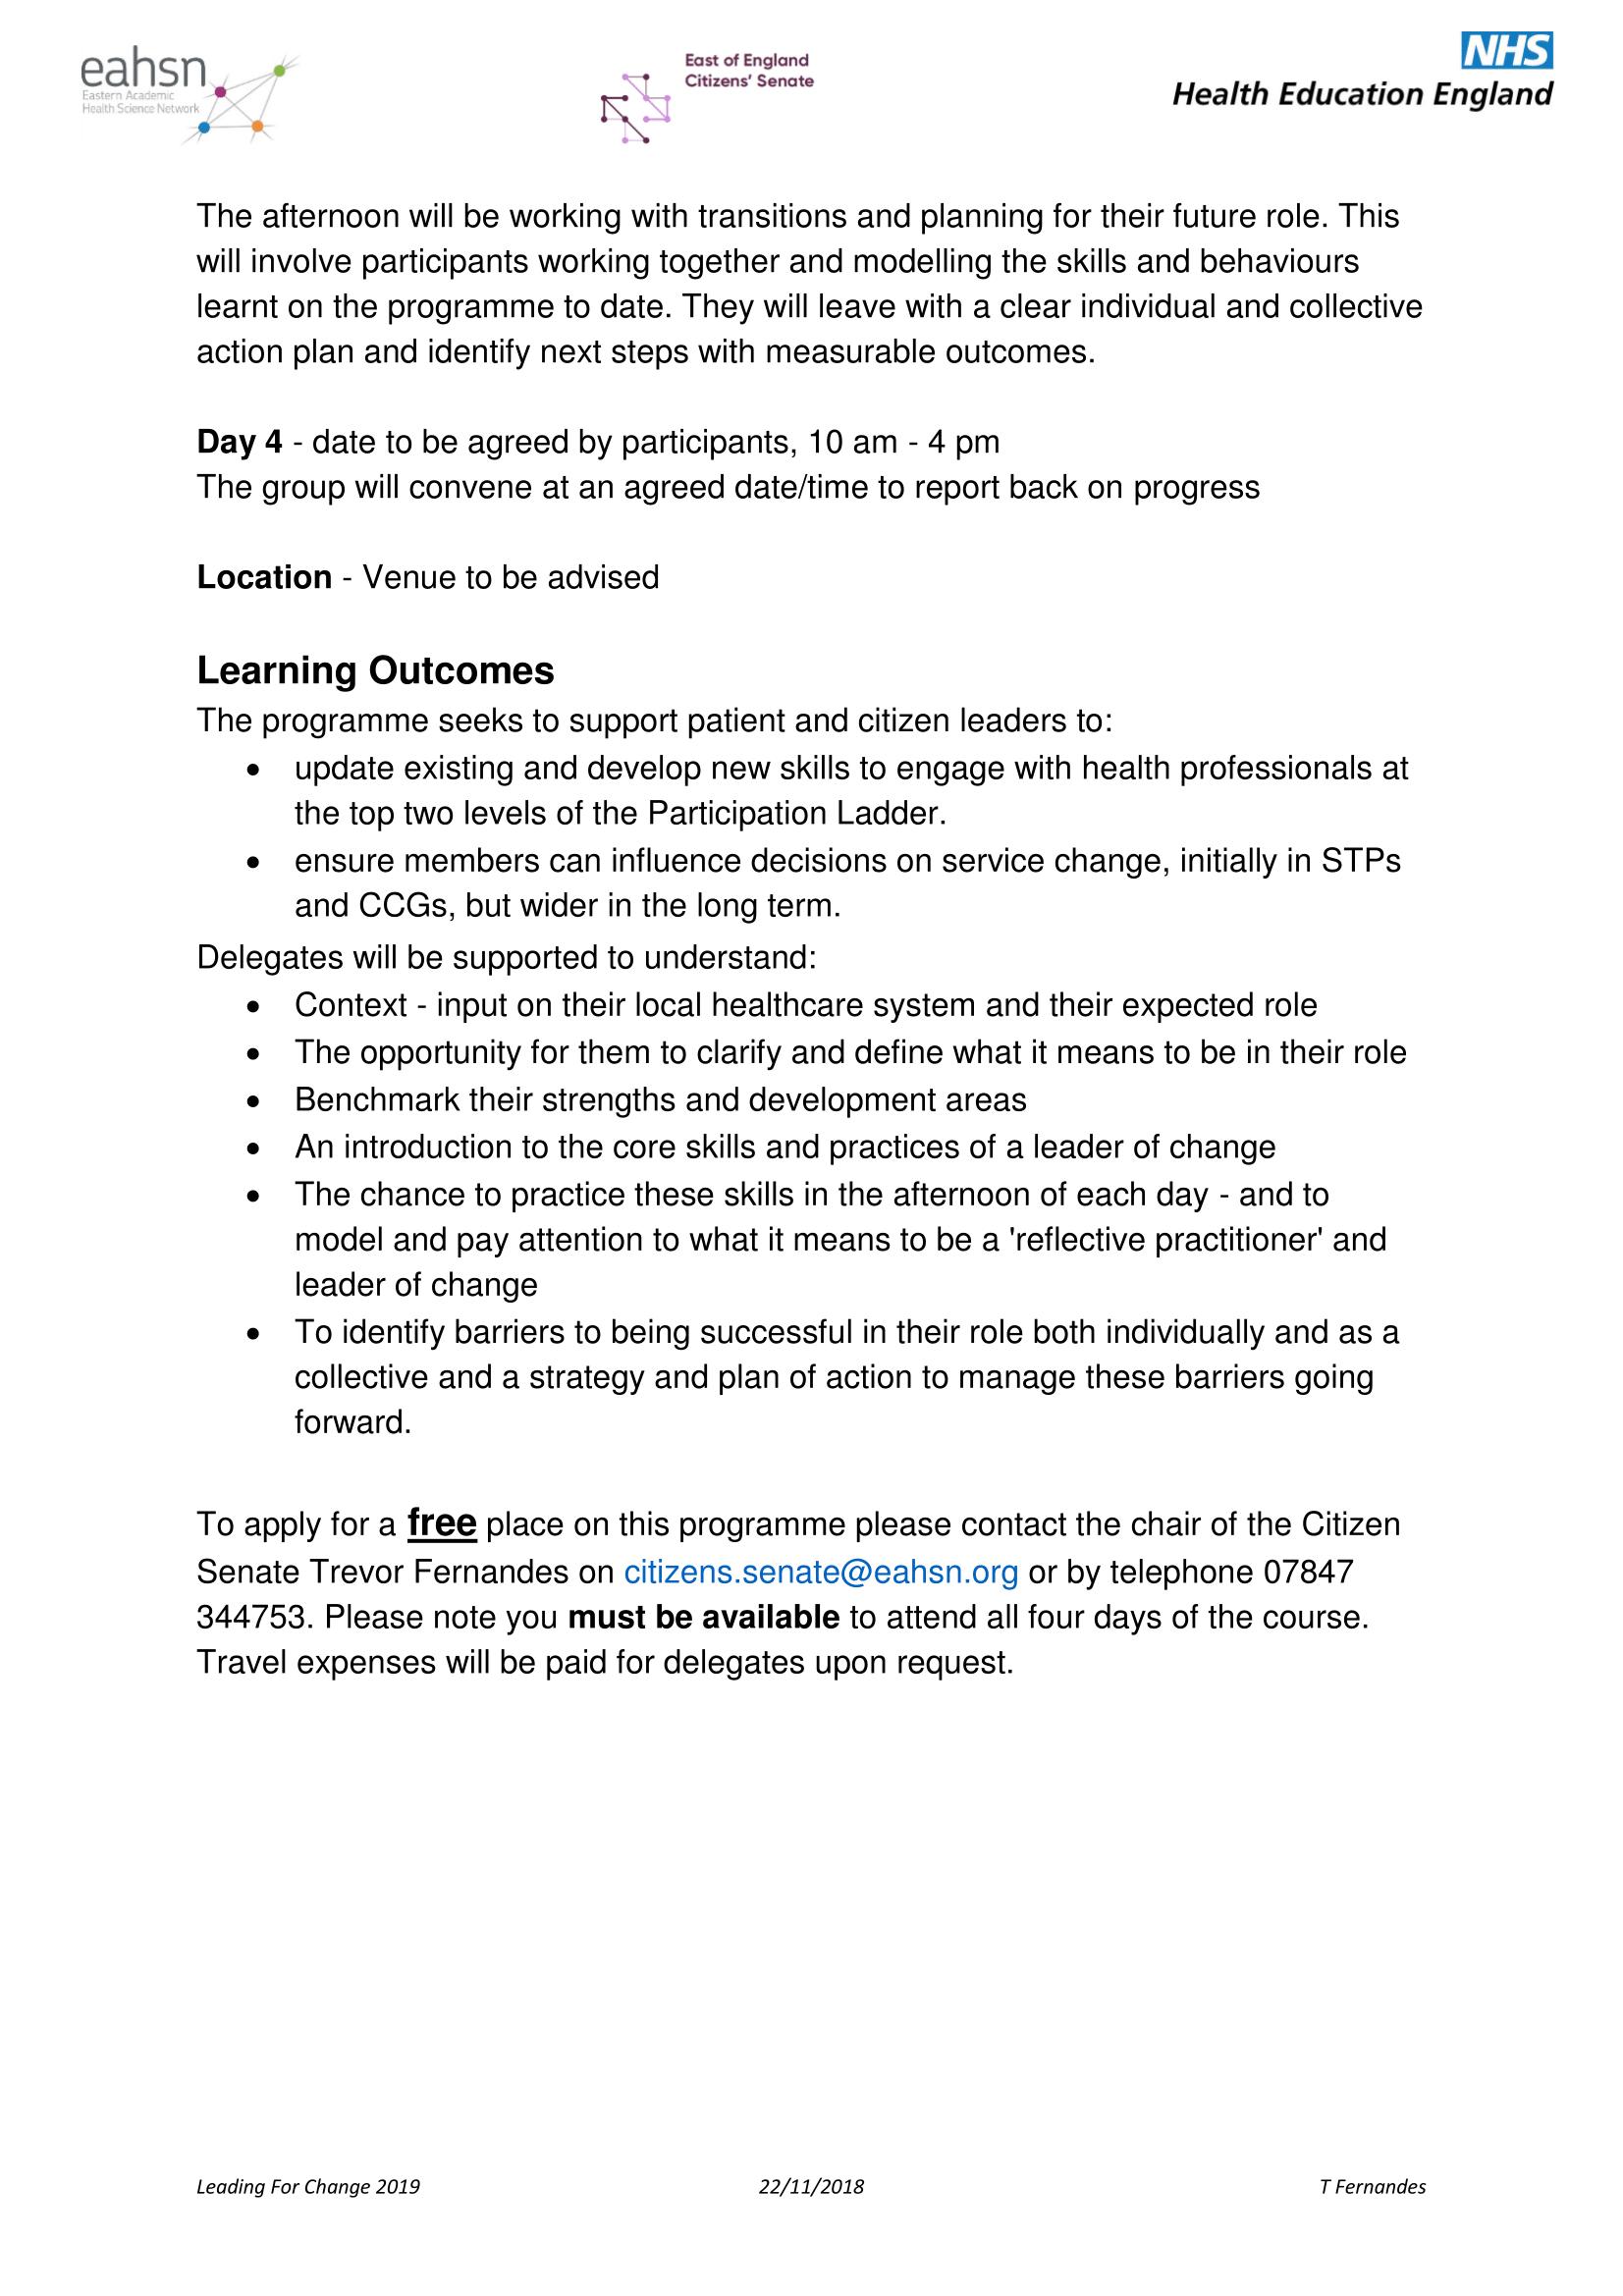 LEADING FOR CHANGE FLYER 2019-3